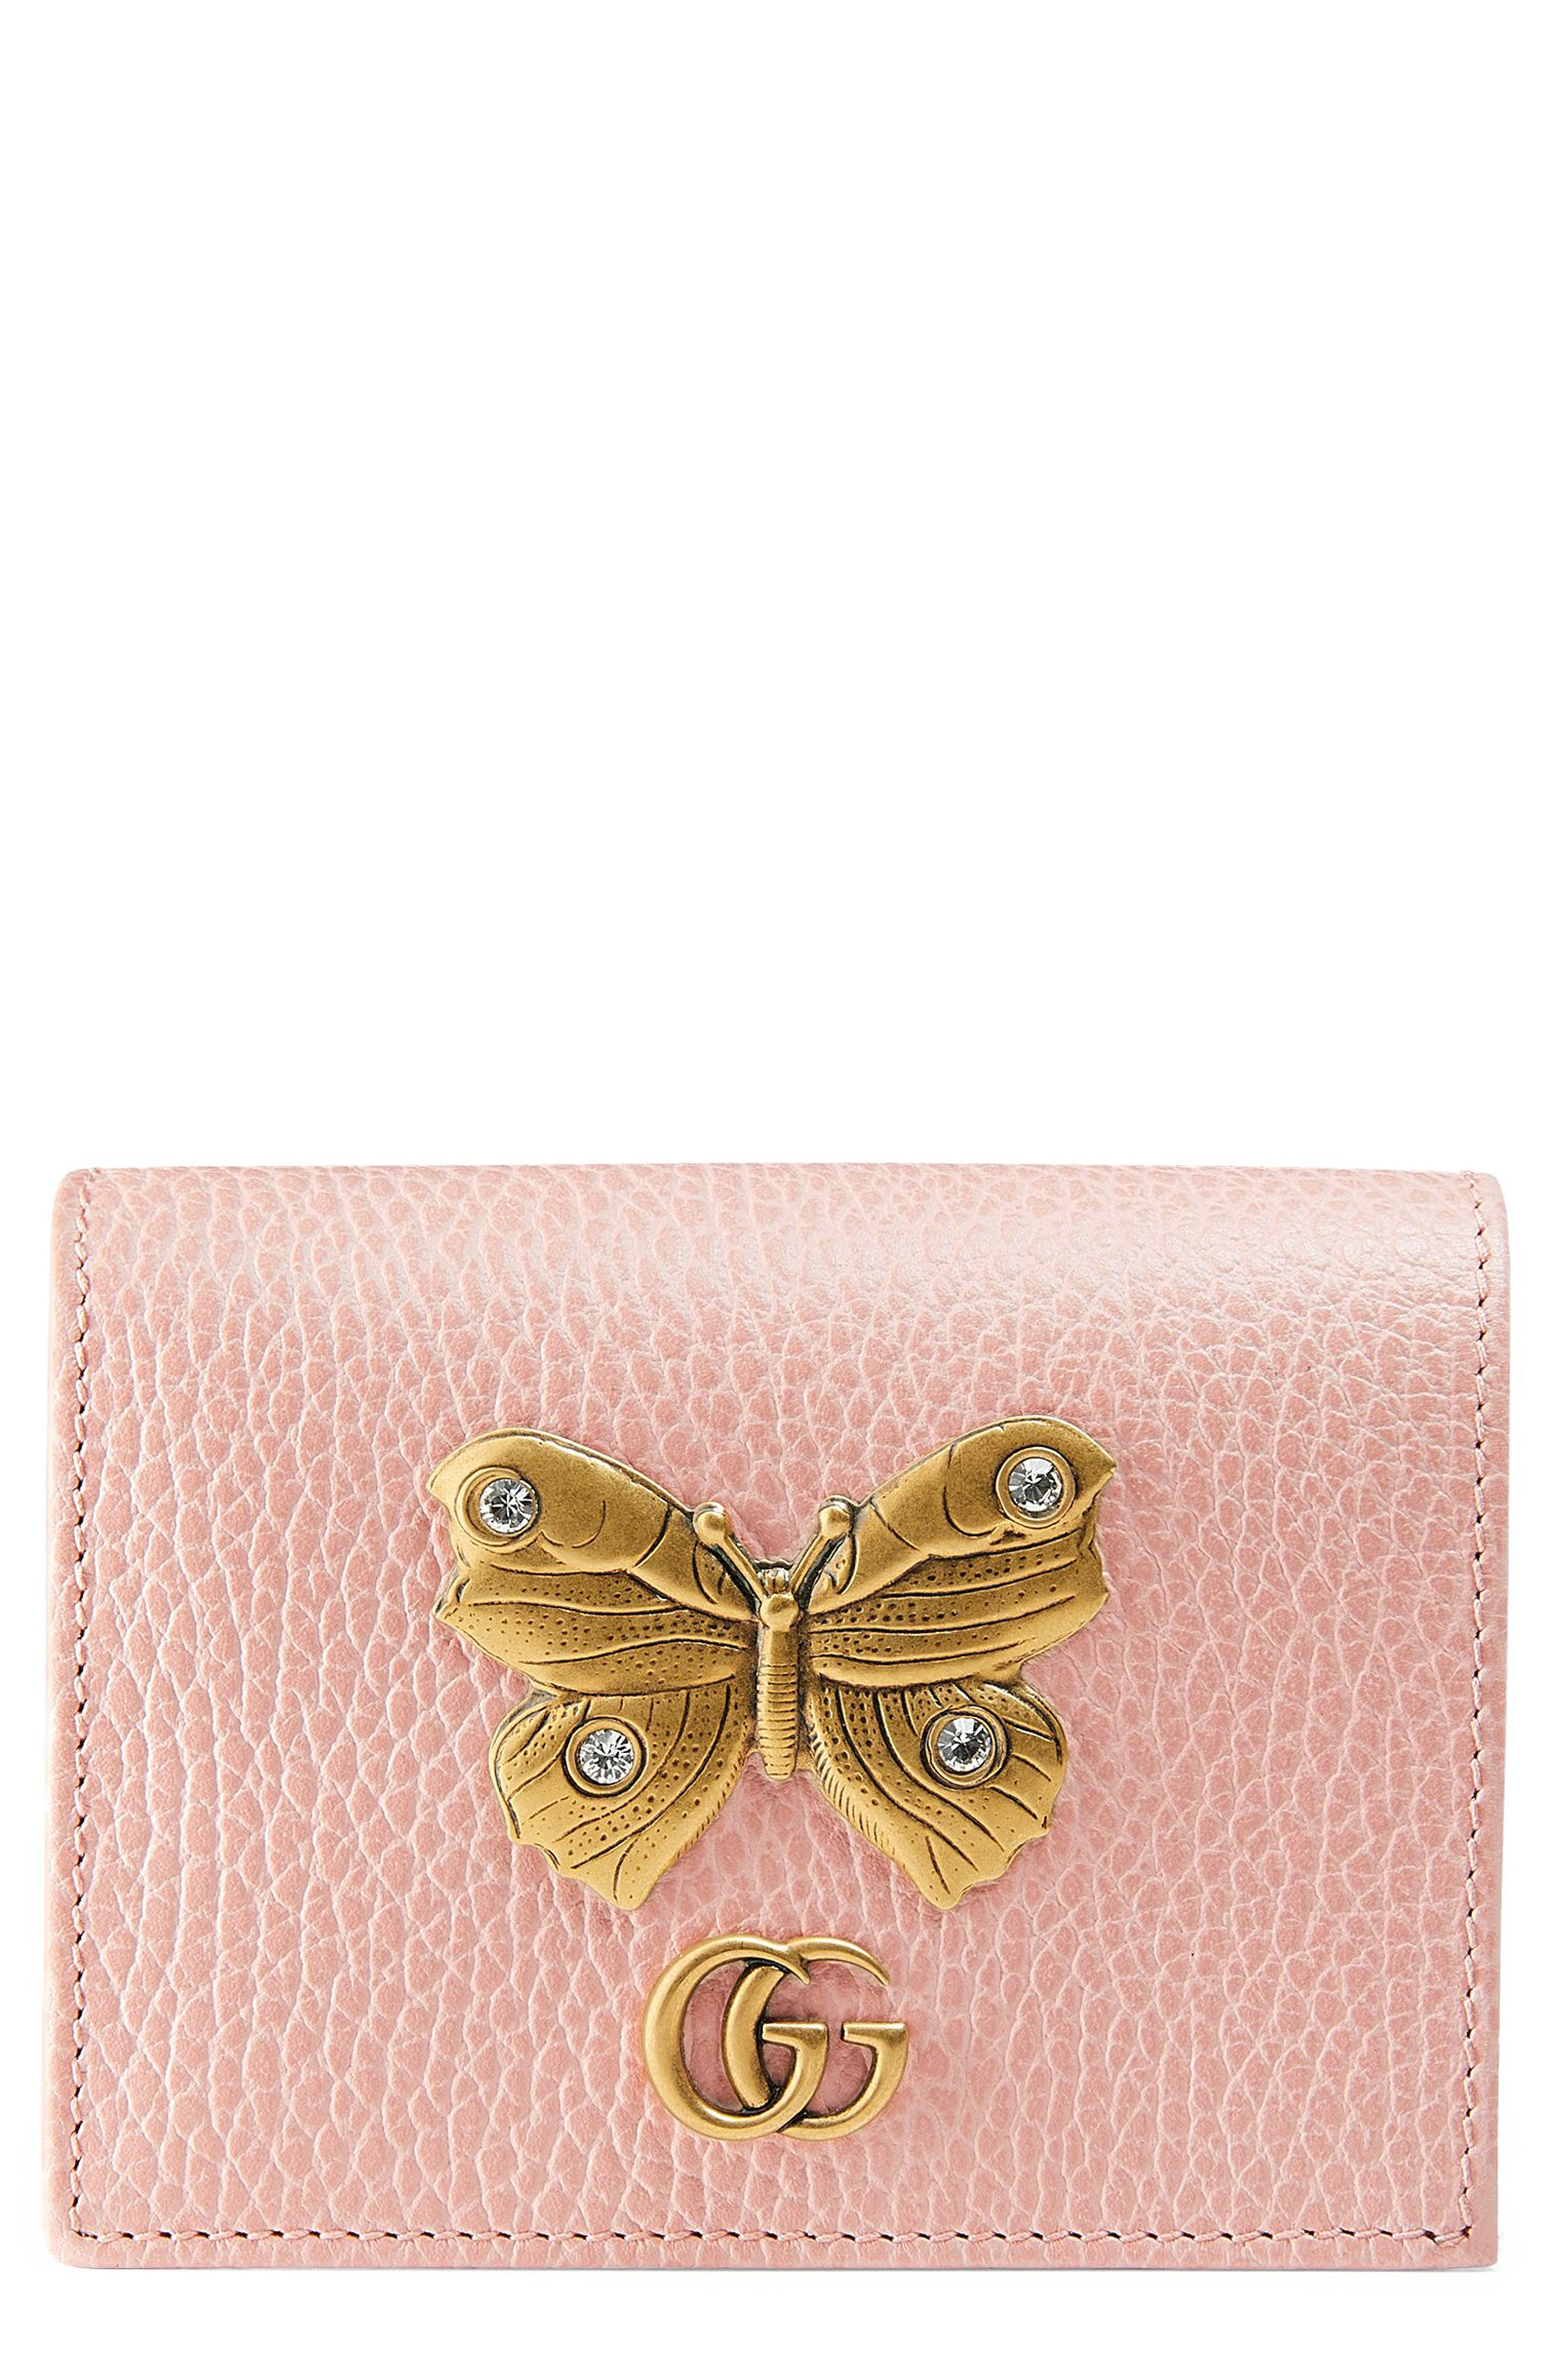 Gucci Farfalla Leather Card Case